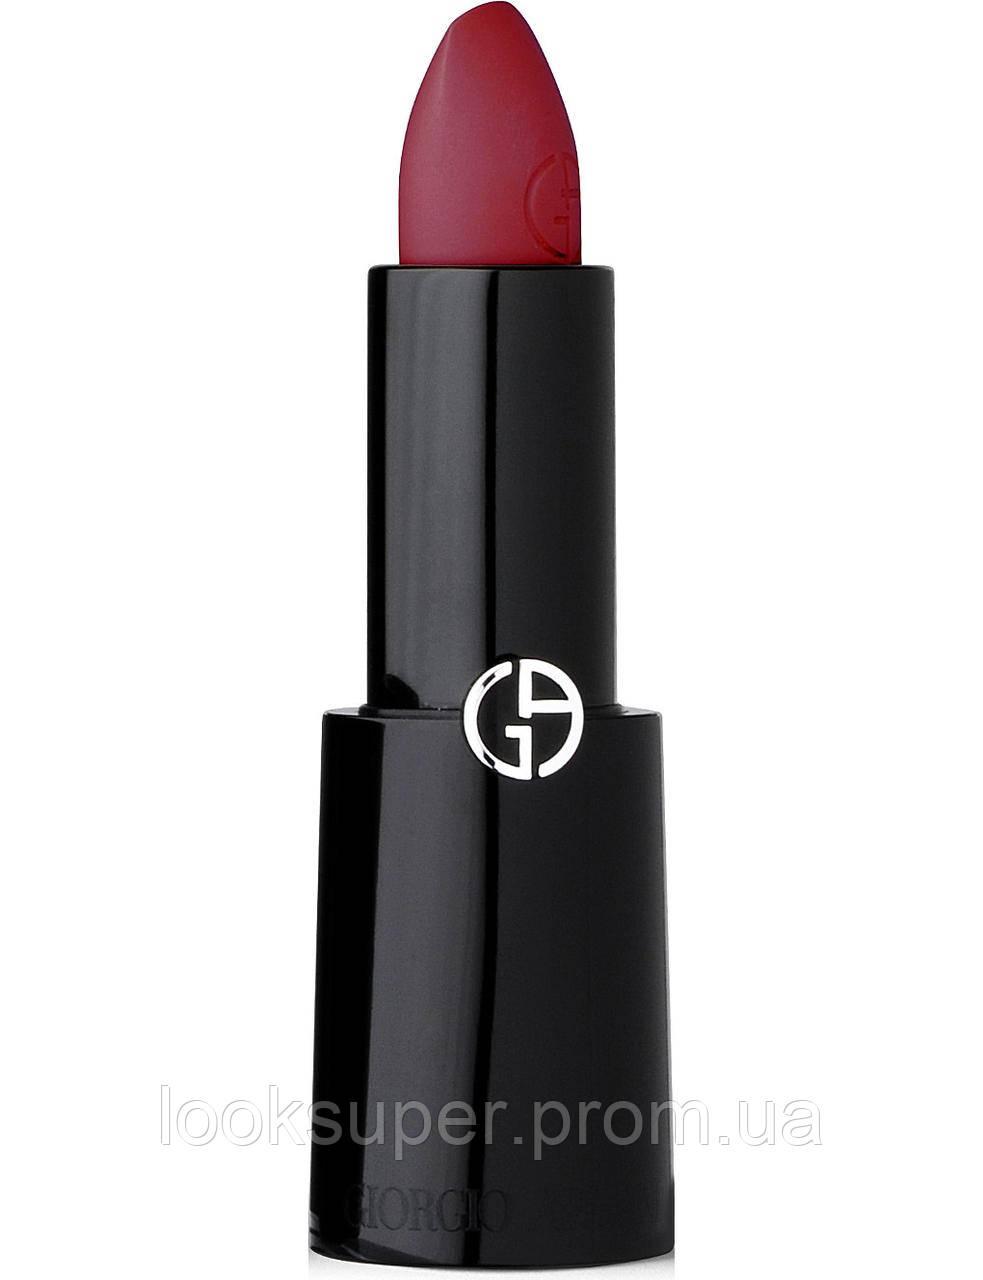 Губная помада GIORGIO ARMANI Rouge d'Armani lipstick Rouge 403